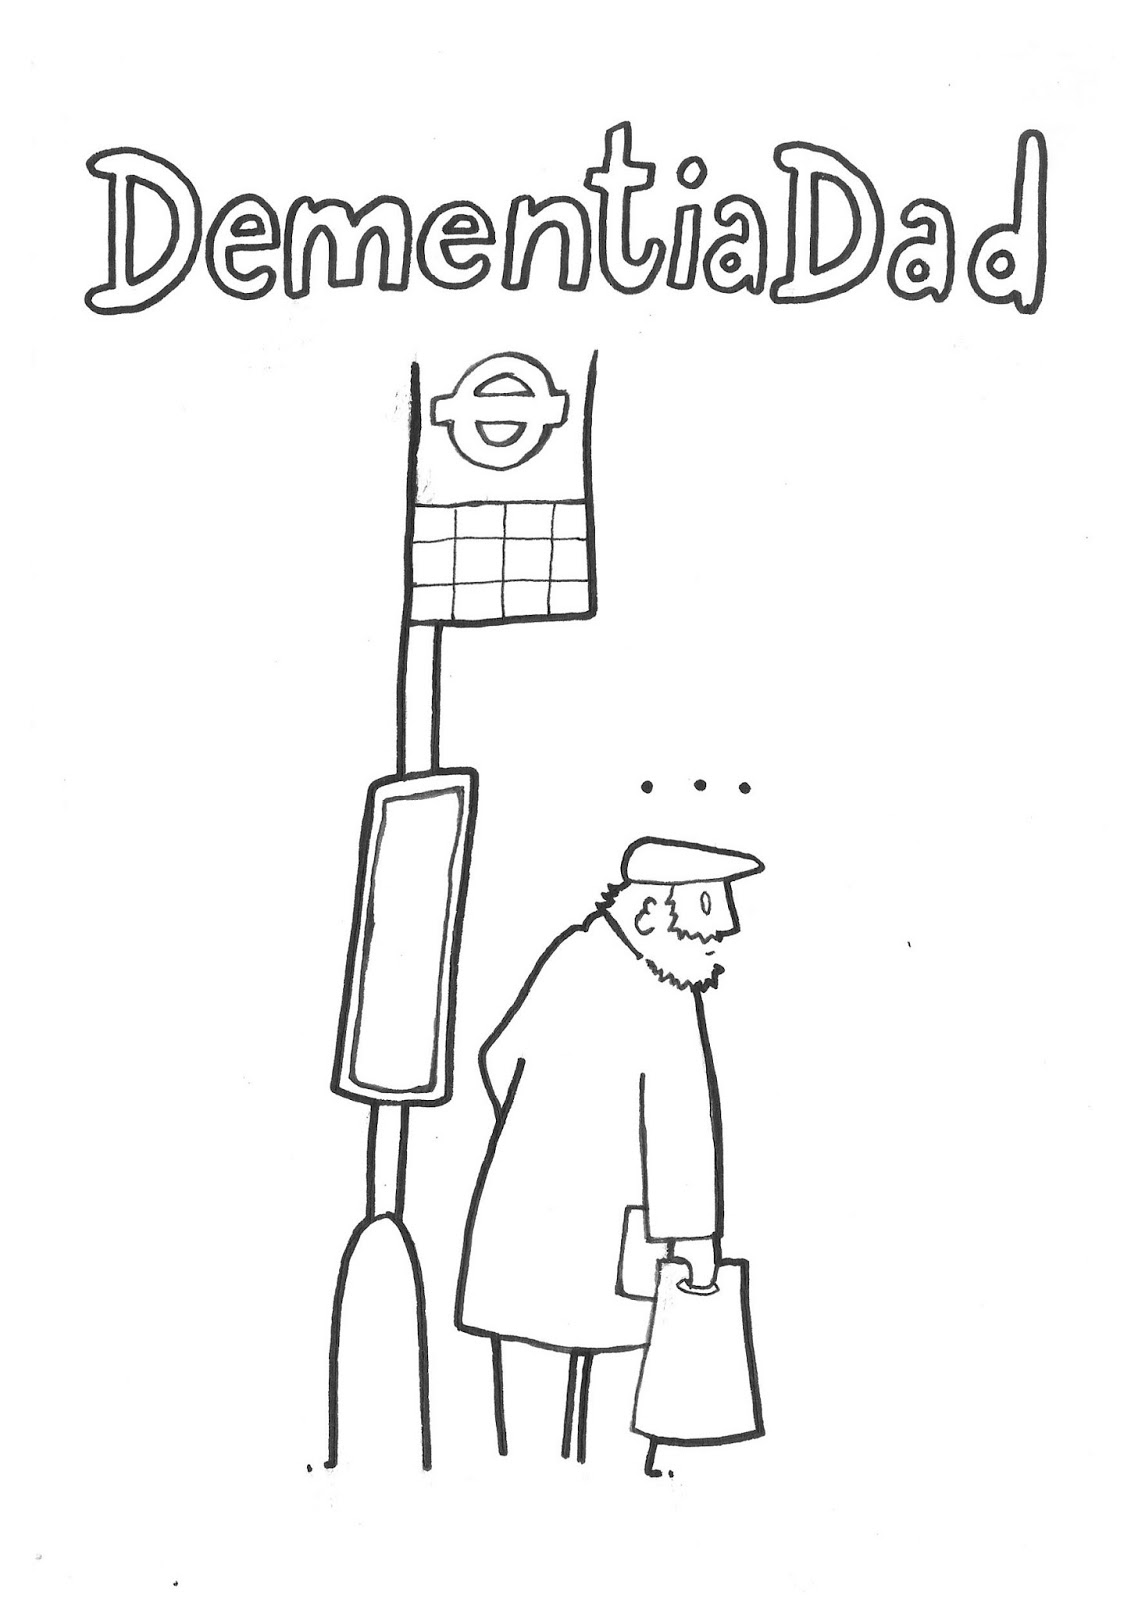 Dementia_Dad_01a